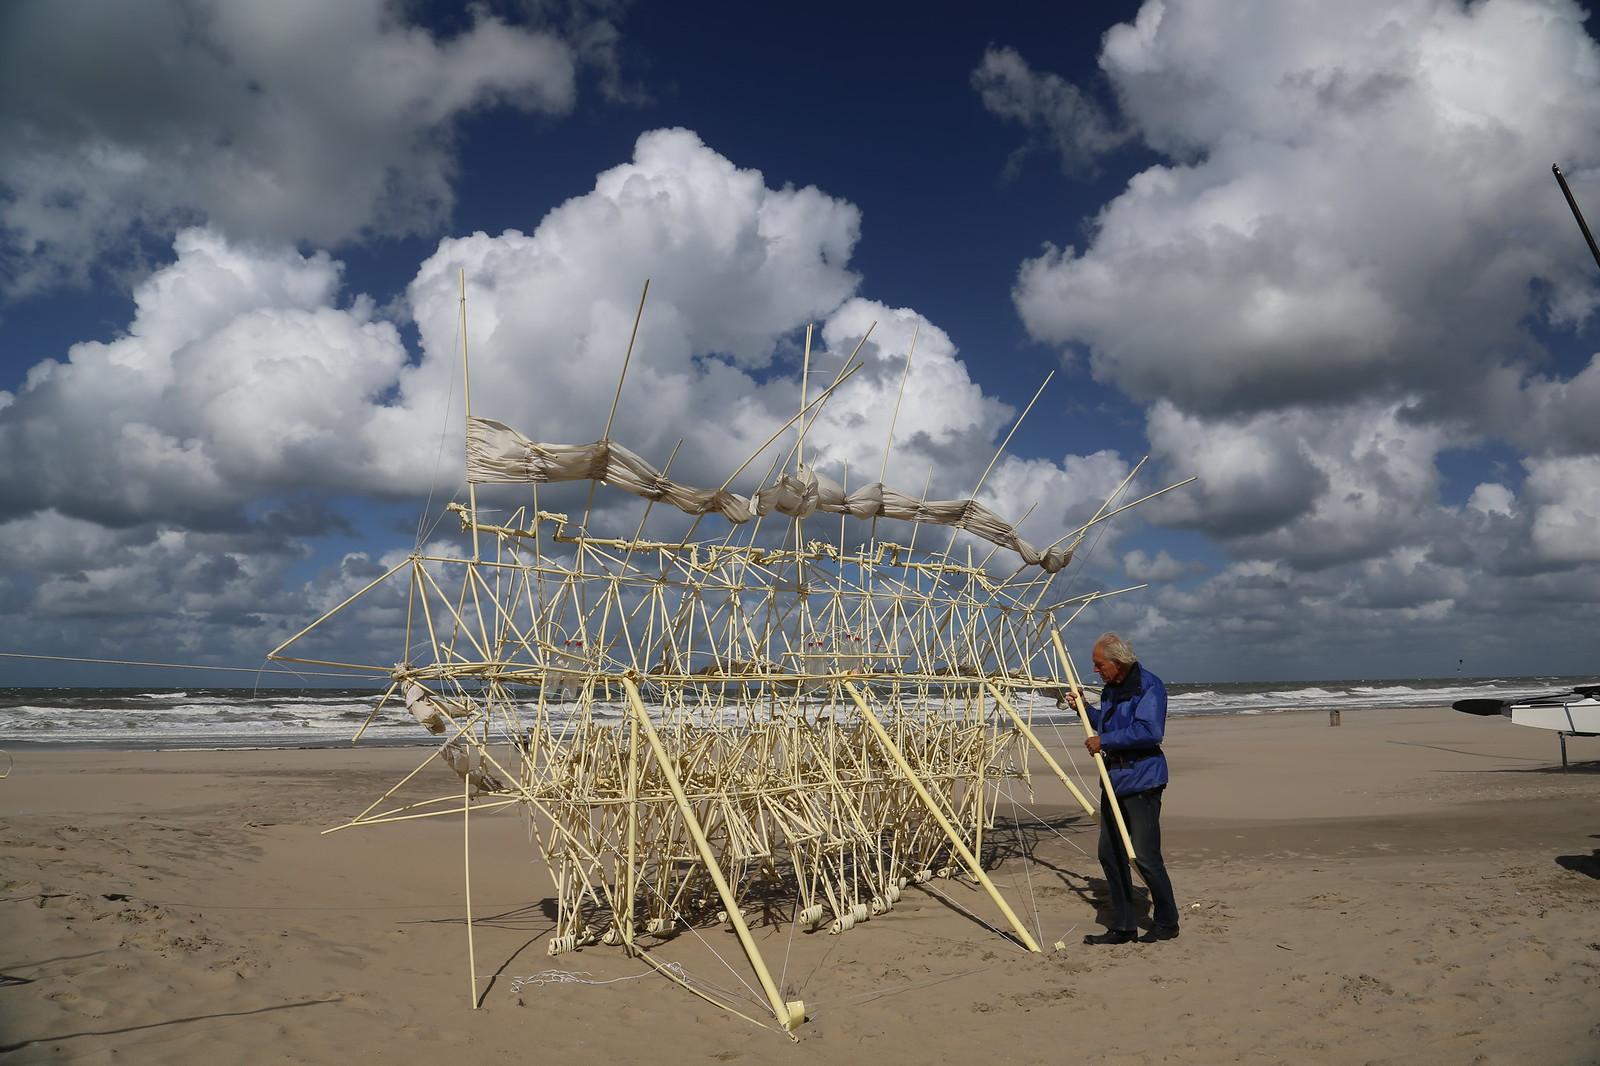 uros kirn 8 apodiacula at the silent beach 2013